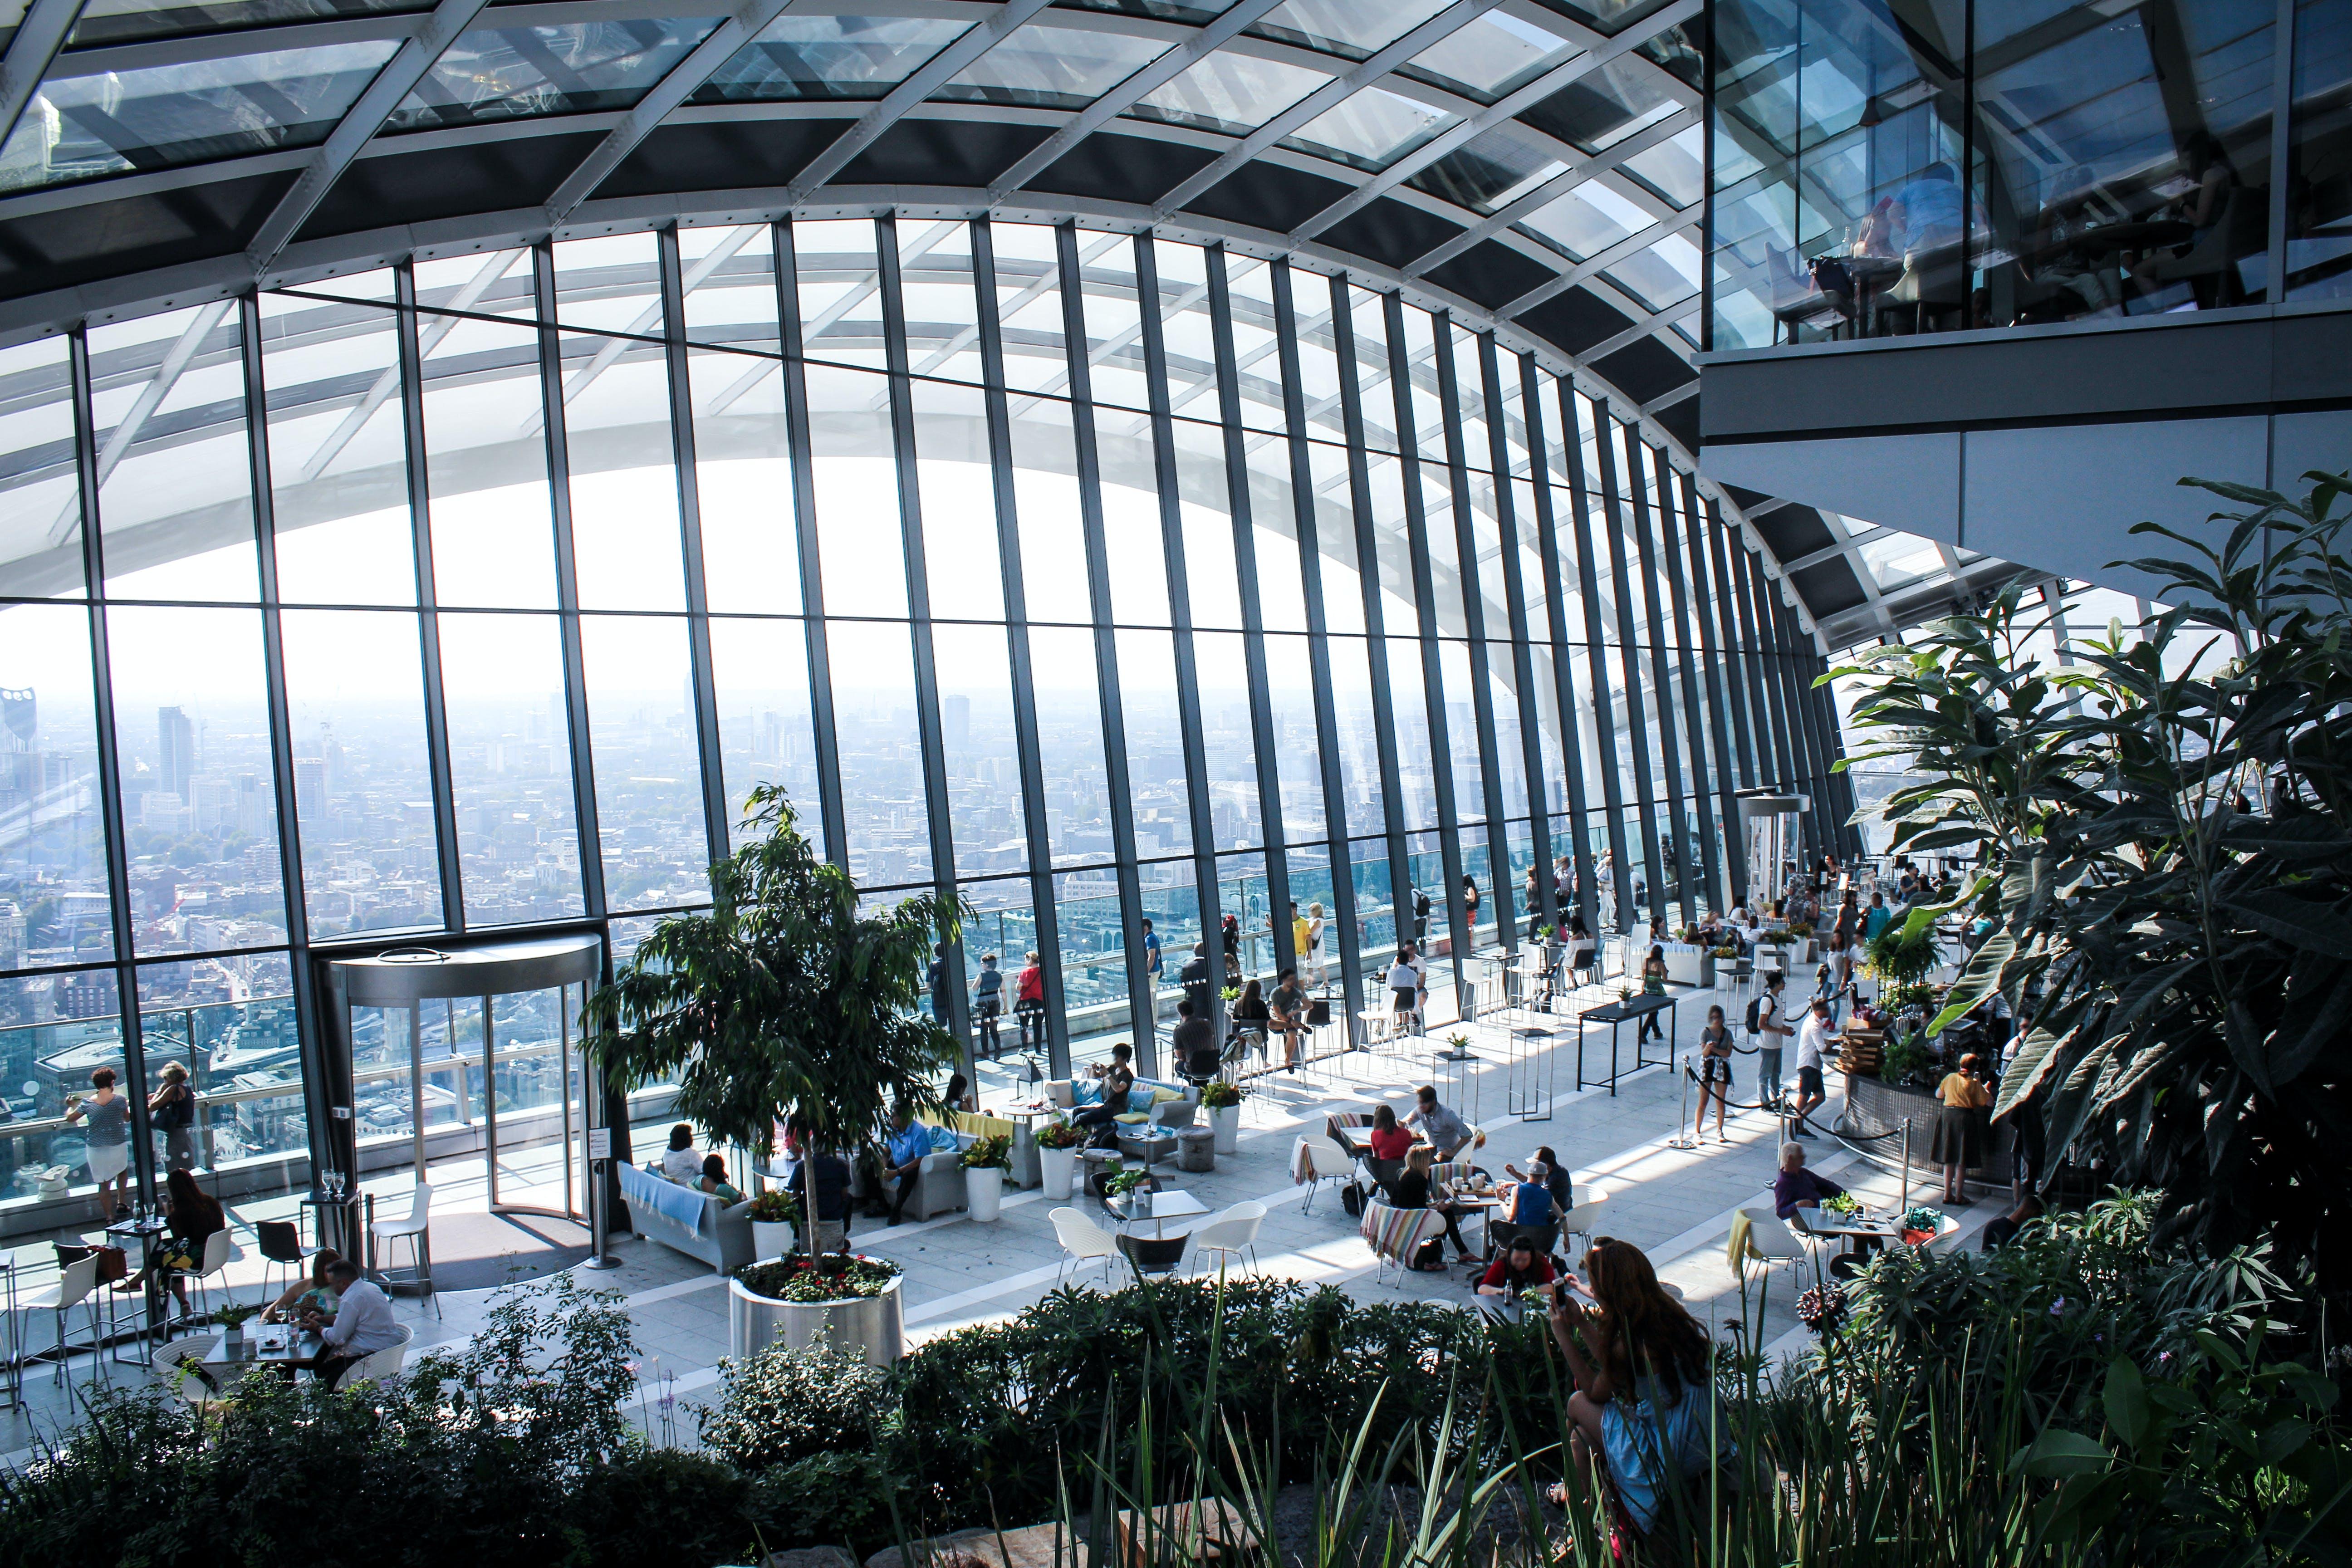 Landscape Photo of People Inside Building